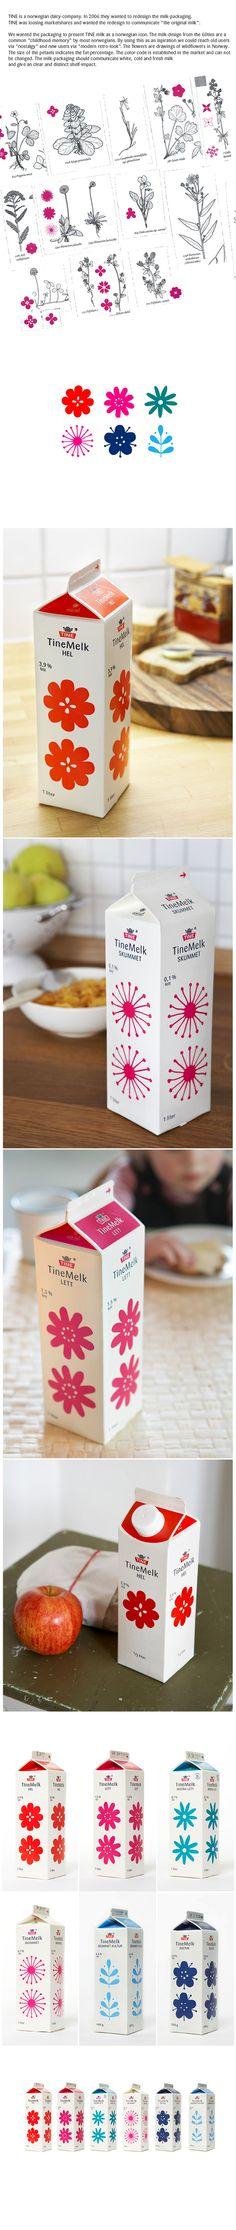 Identidade visual delicada para embalagens de Leite  Designed by Dinamo Design